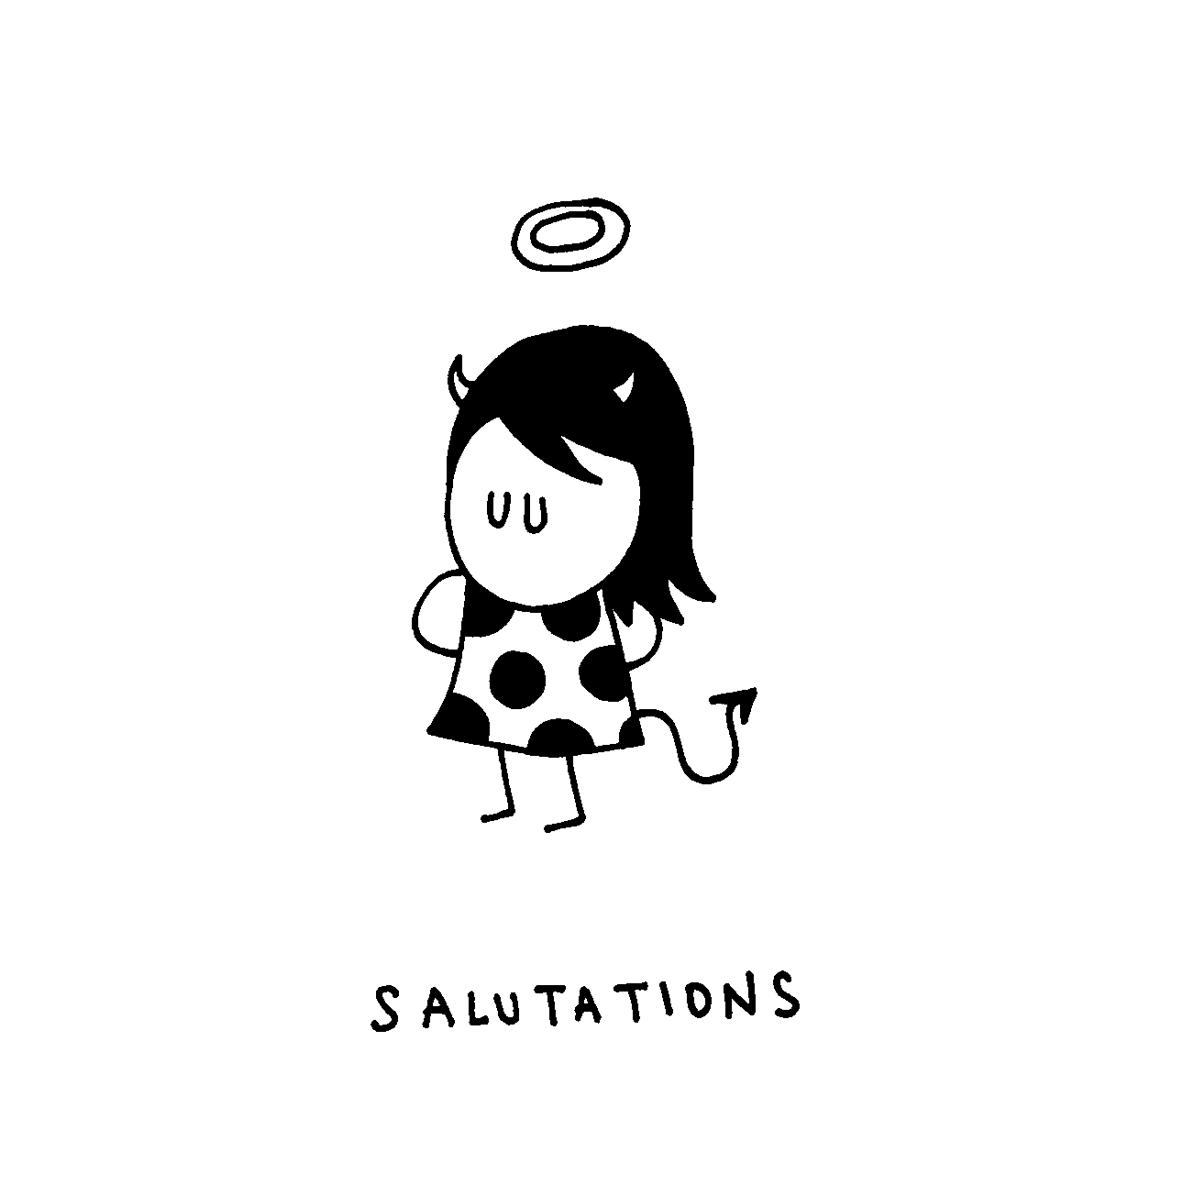 41-salutations.jpg